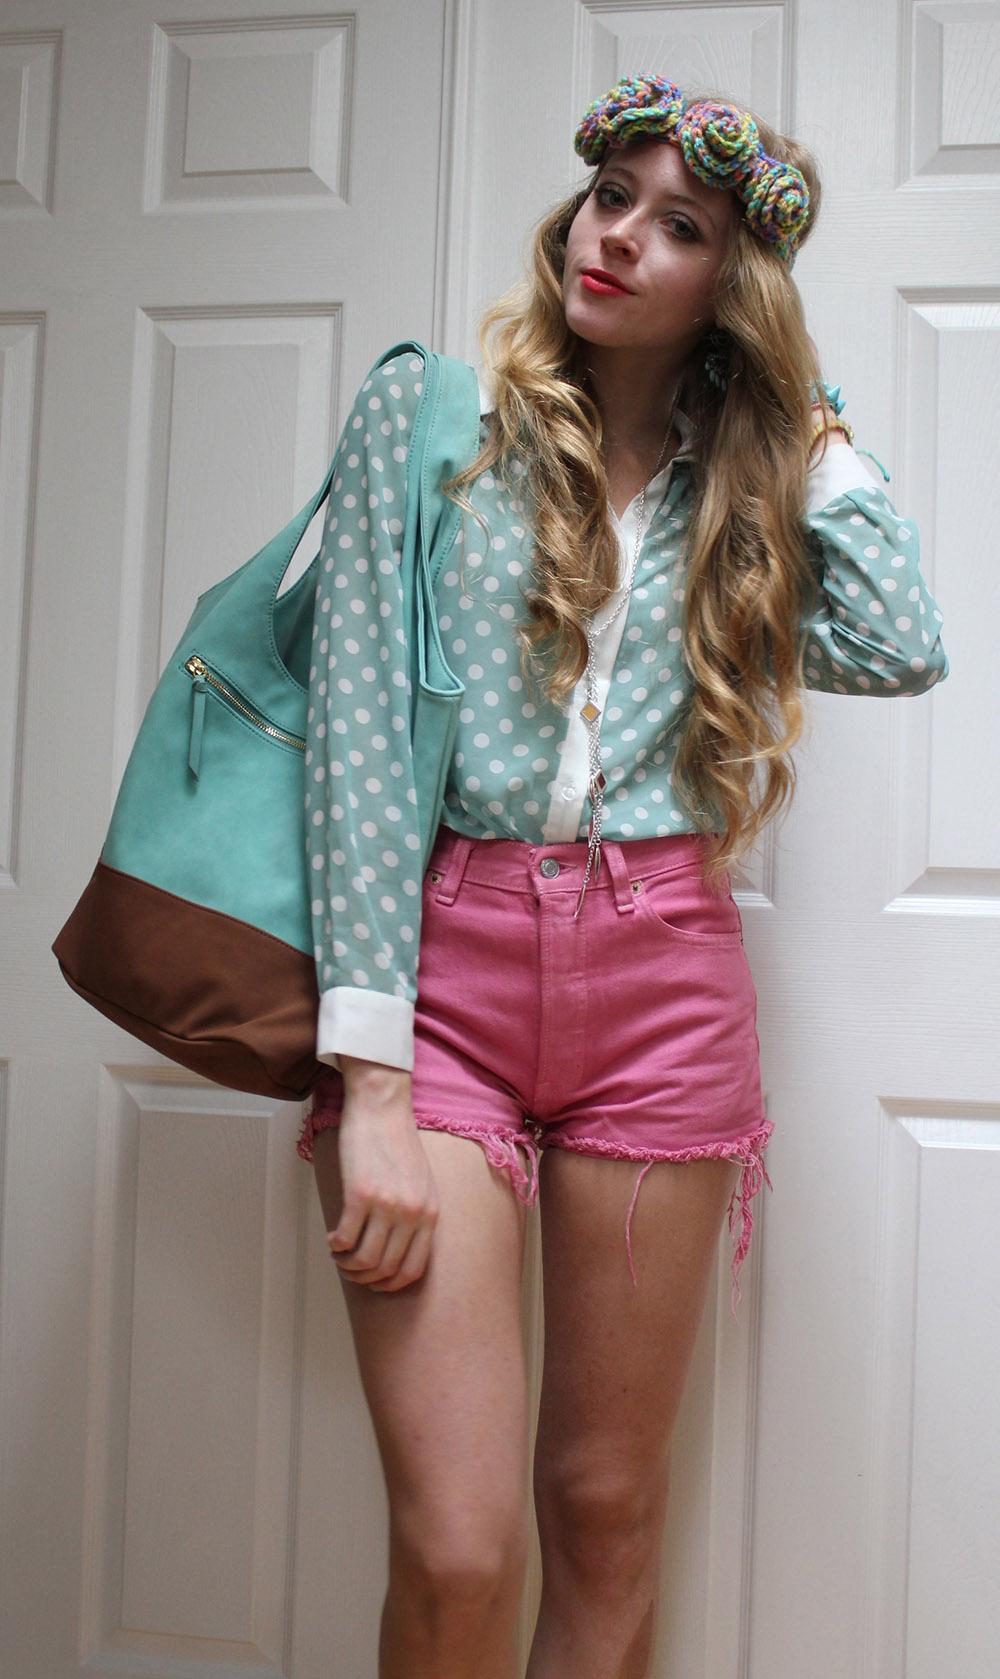 polka dot blouse levis cut offs